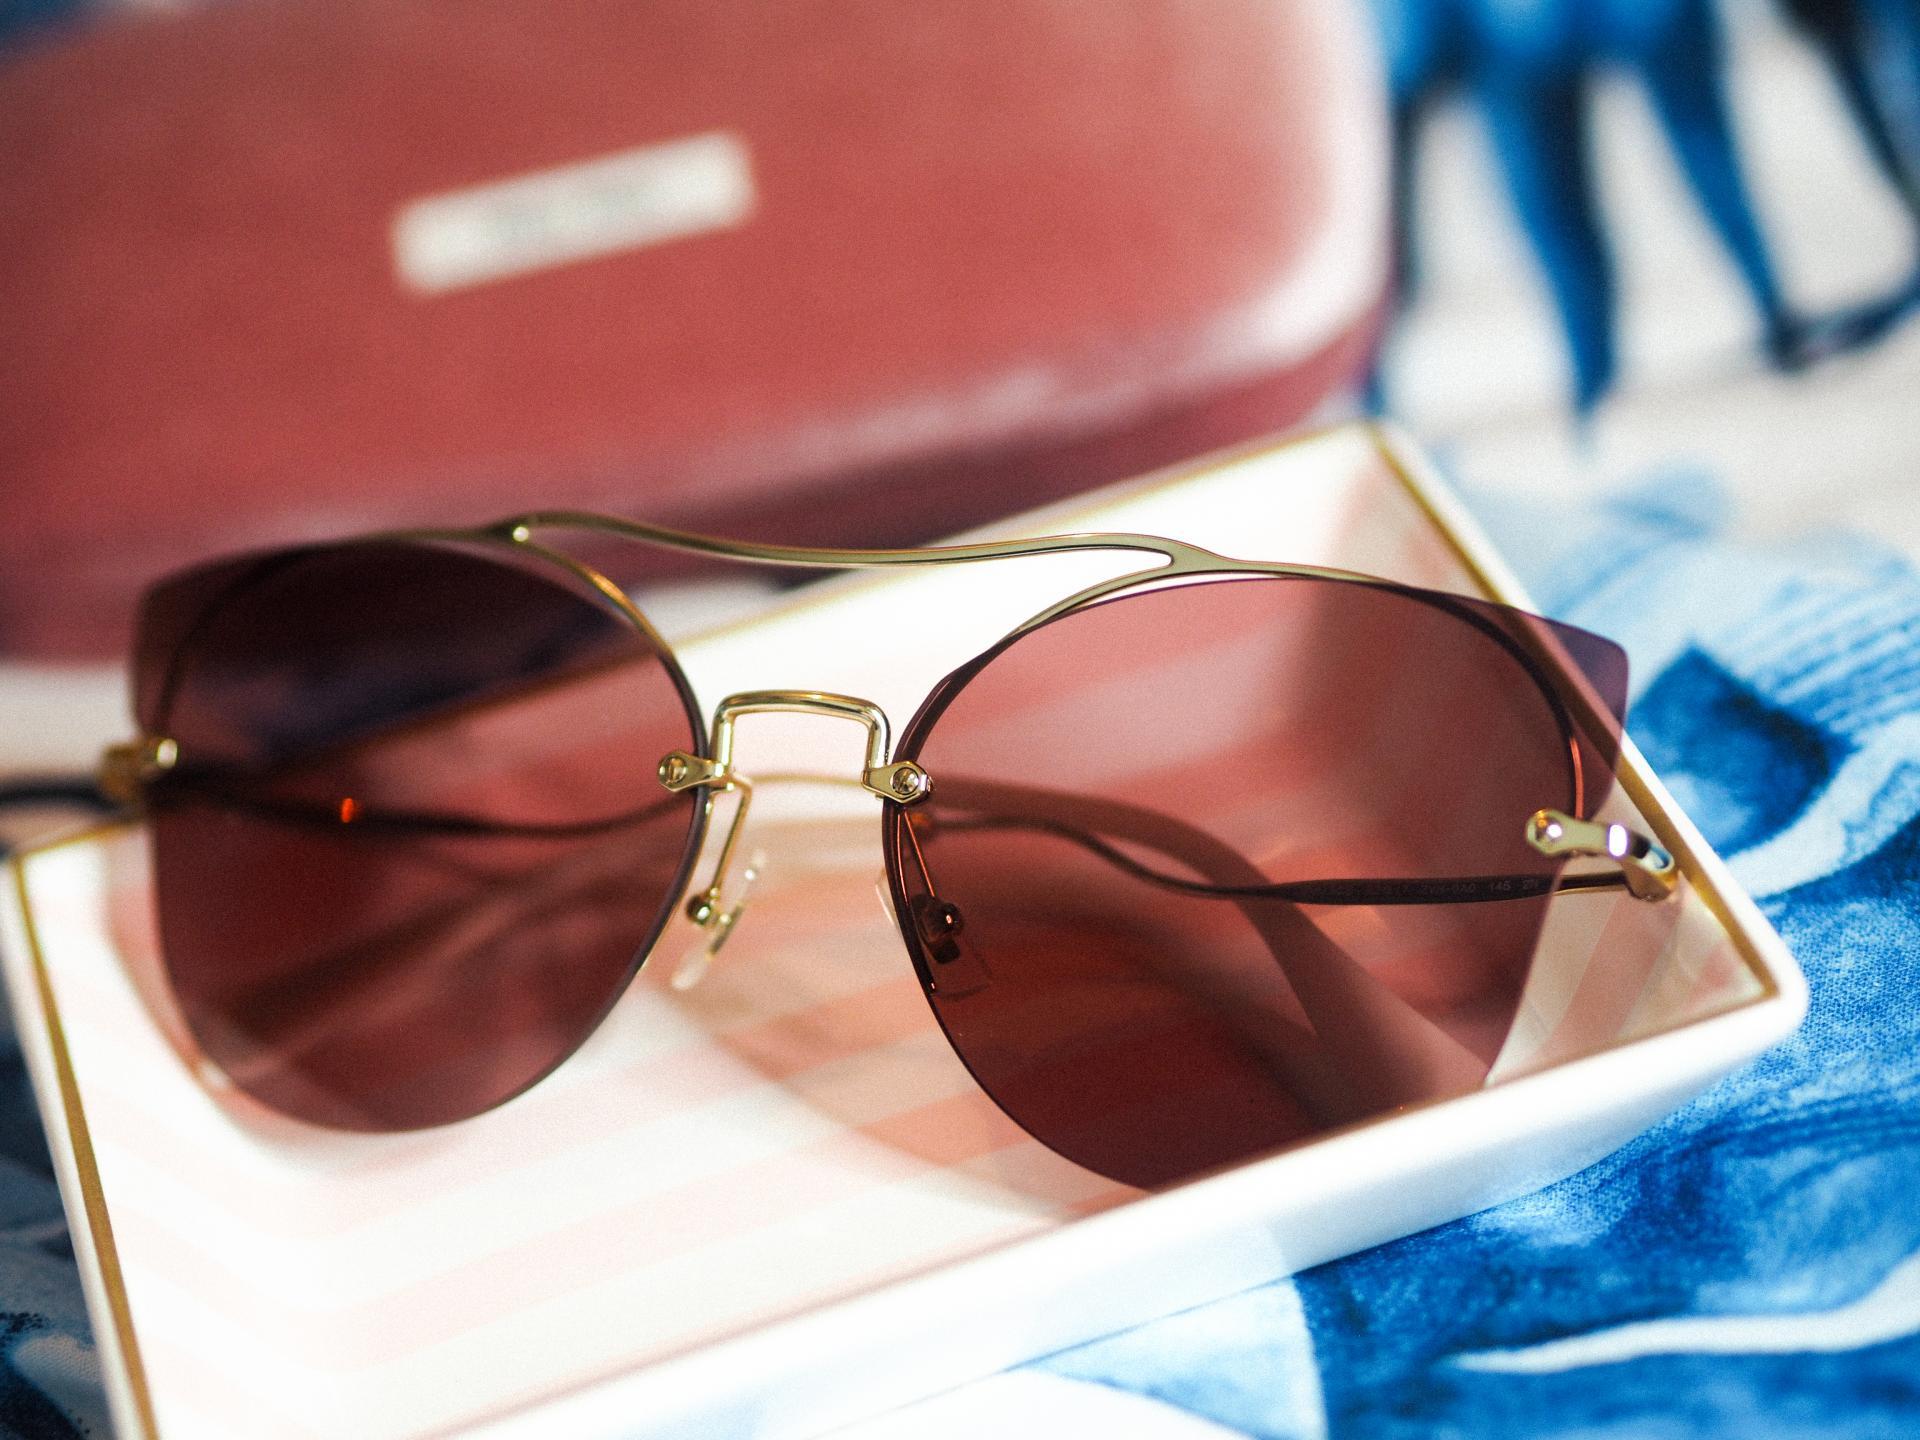 Miu Miu MU52SS Sunglasses from SmartBuyGlasses - Rachel Nicole UK Blogger